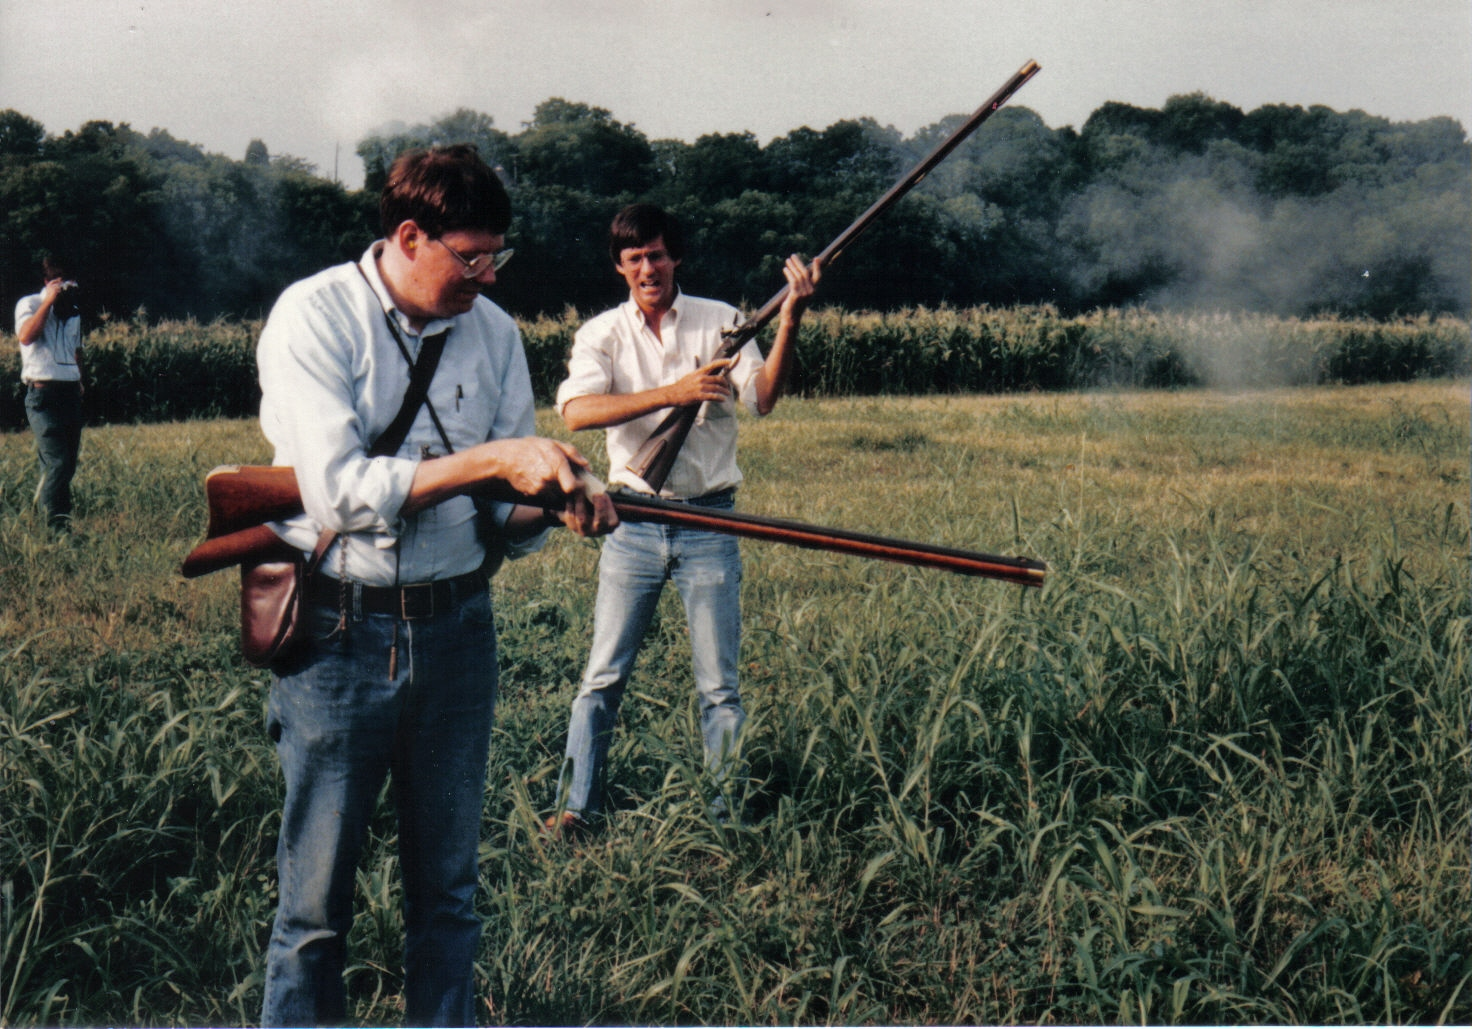 Larry Bohnet John Bivens Shooting